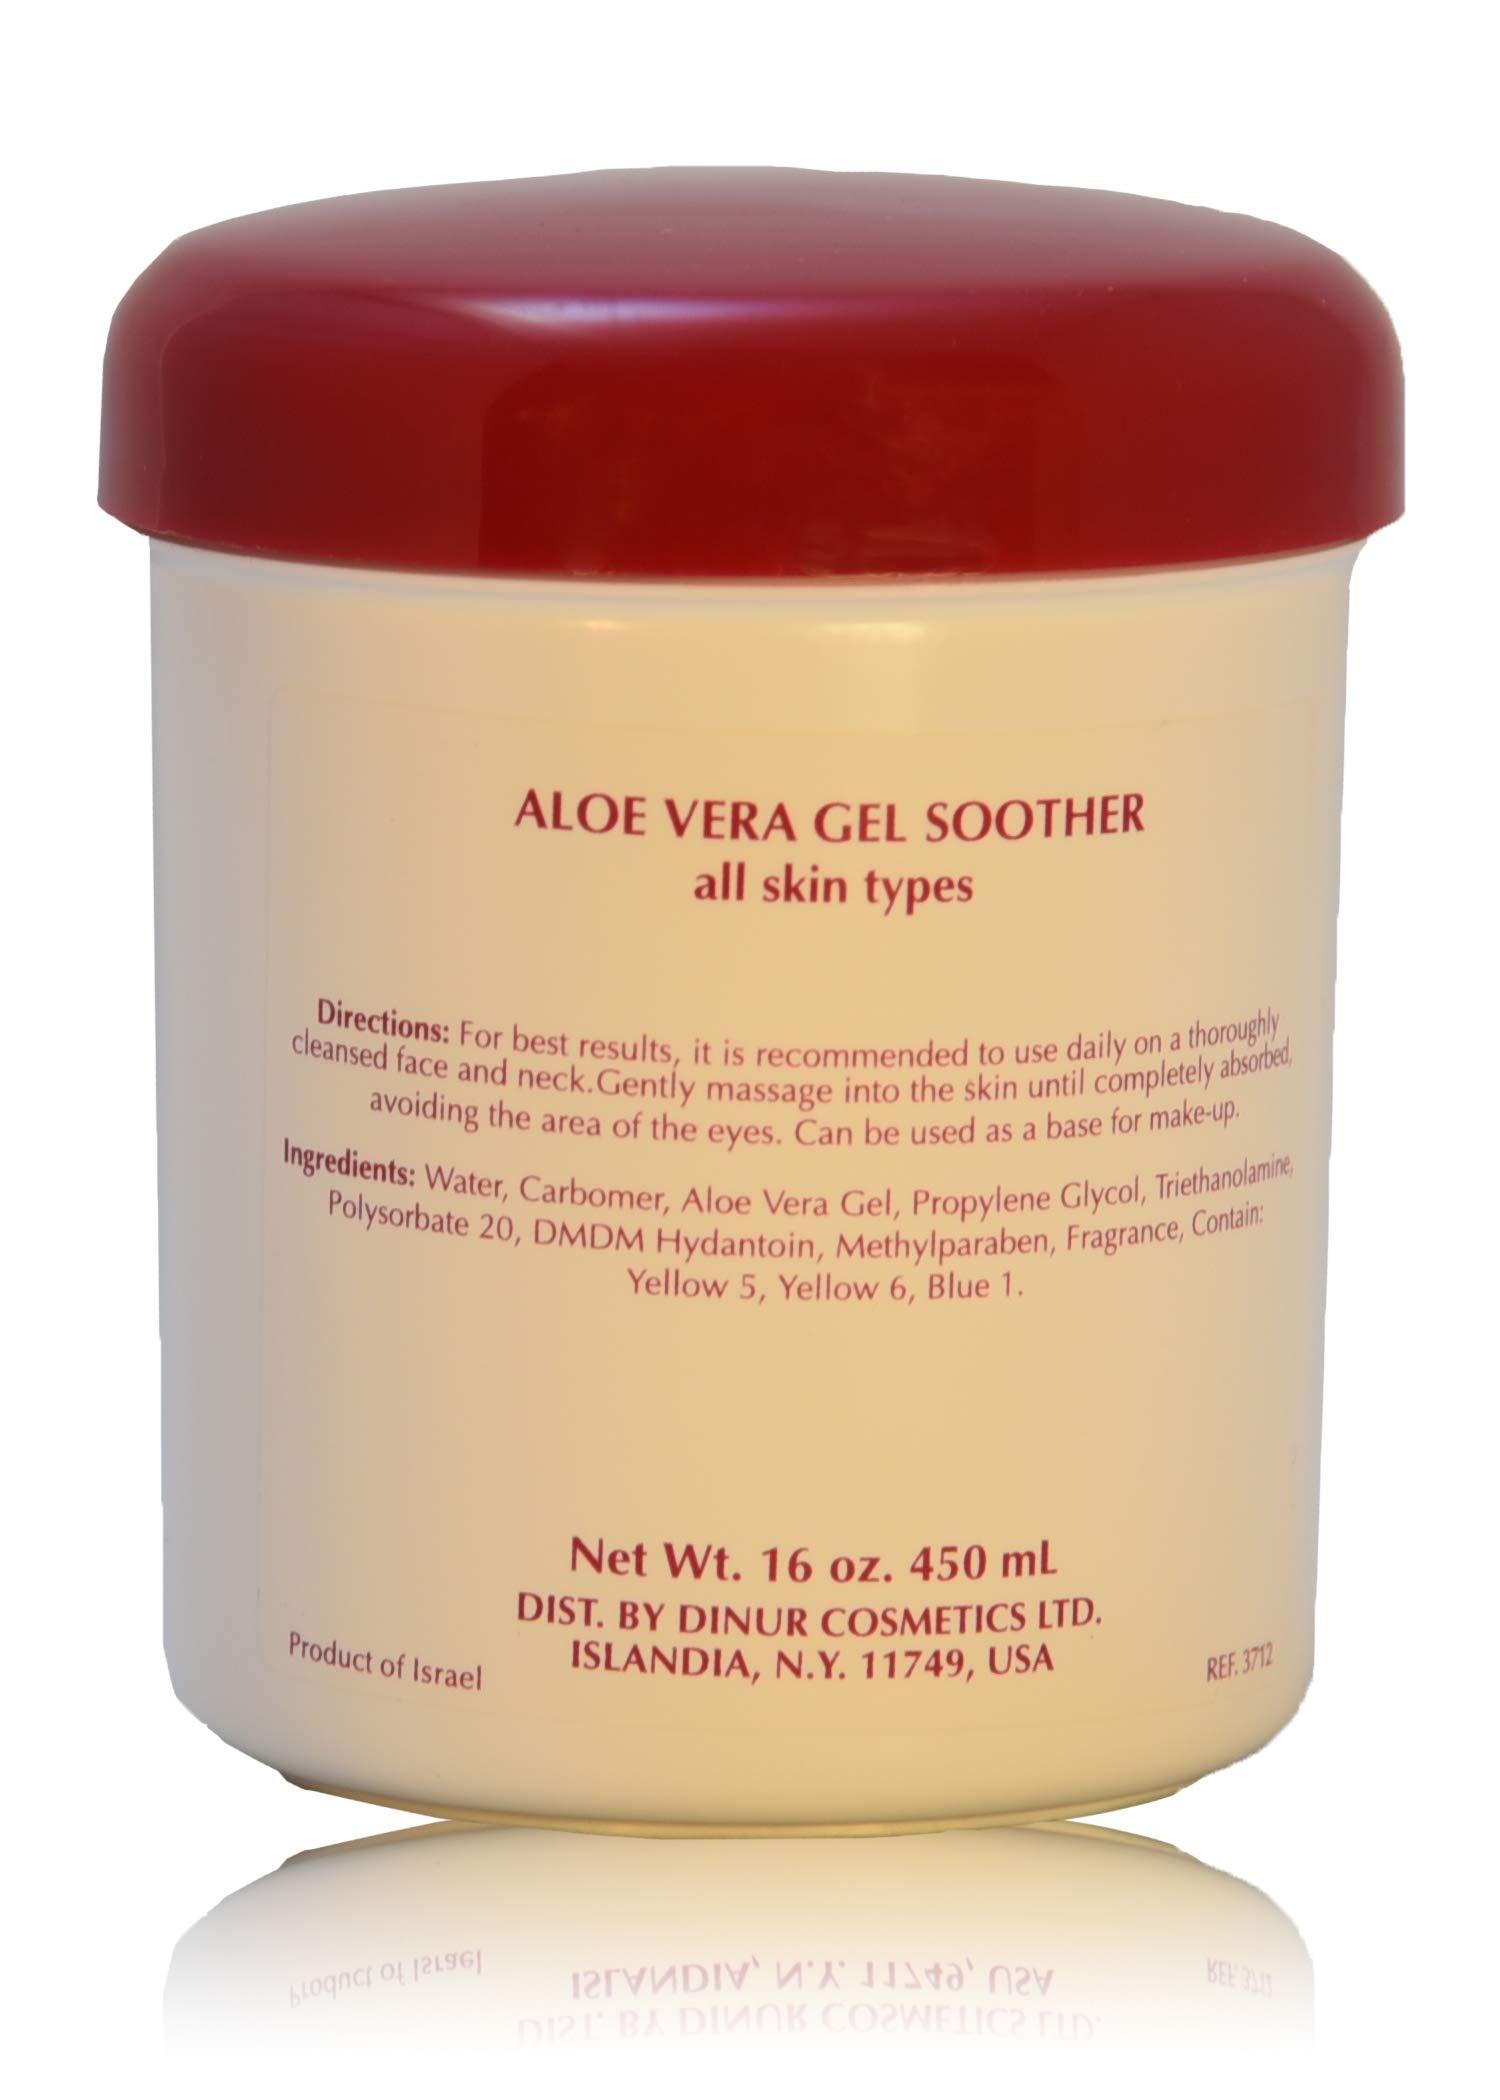 Dinur Cosmetics ALOE VERA GEL SOOTHER 16 oz. 450 ml.